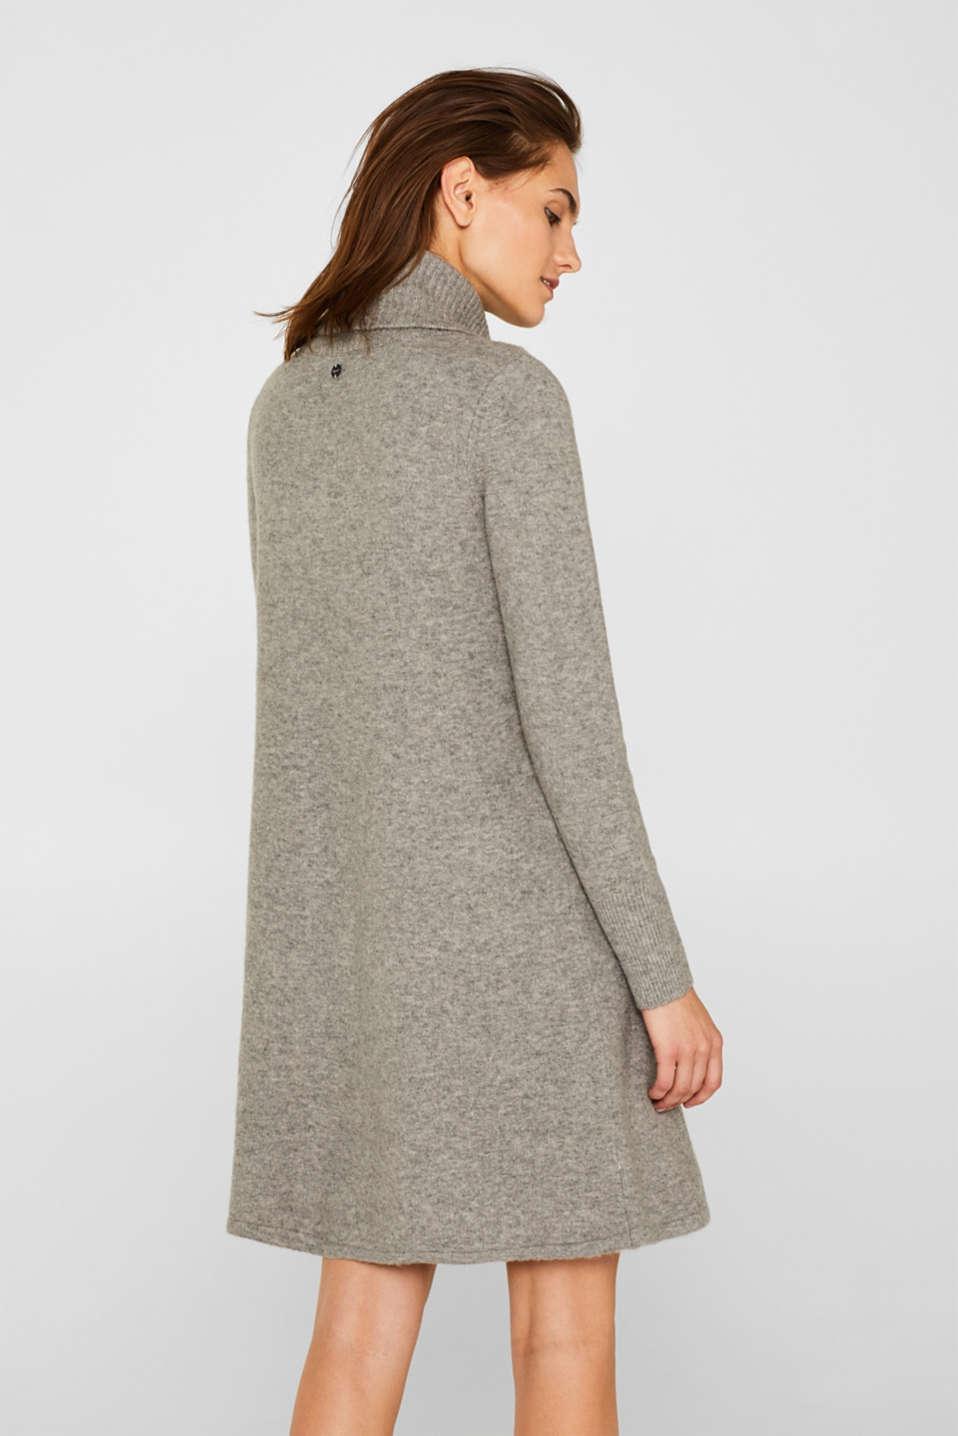 Dresses flat knitted, MEDIUM GREY 5, detail image number 2